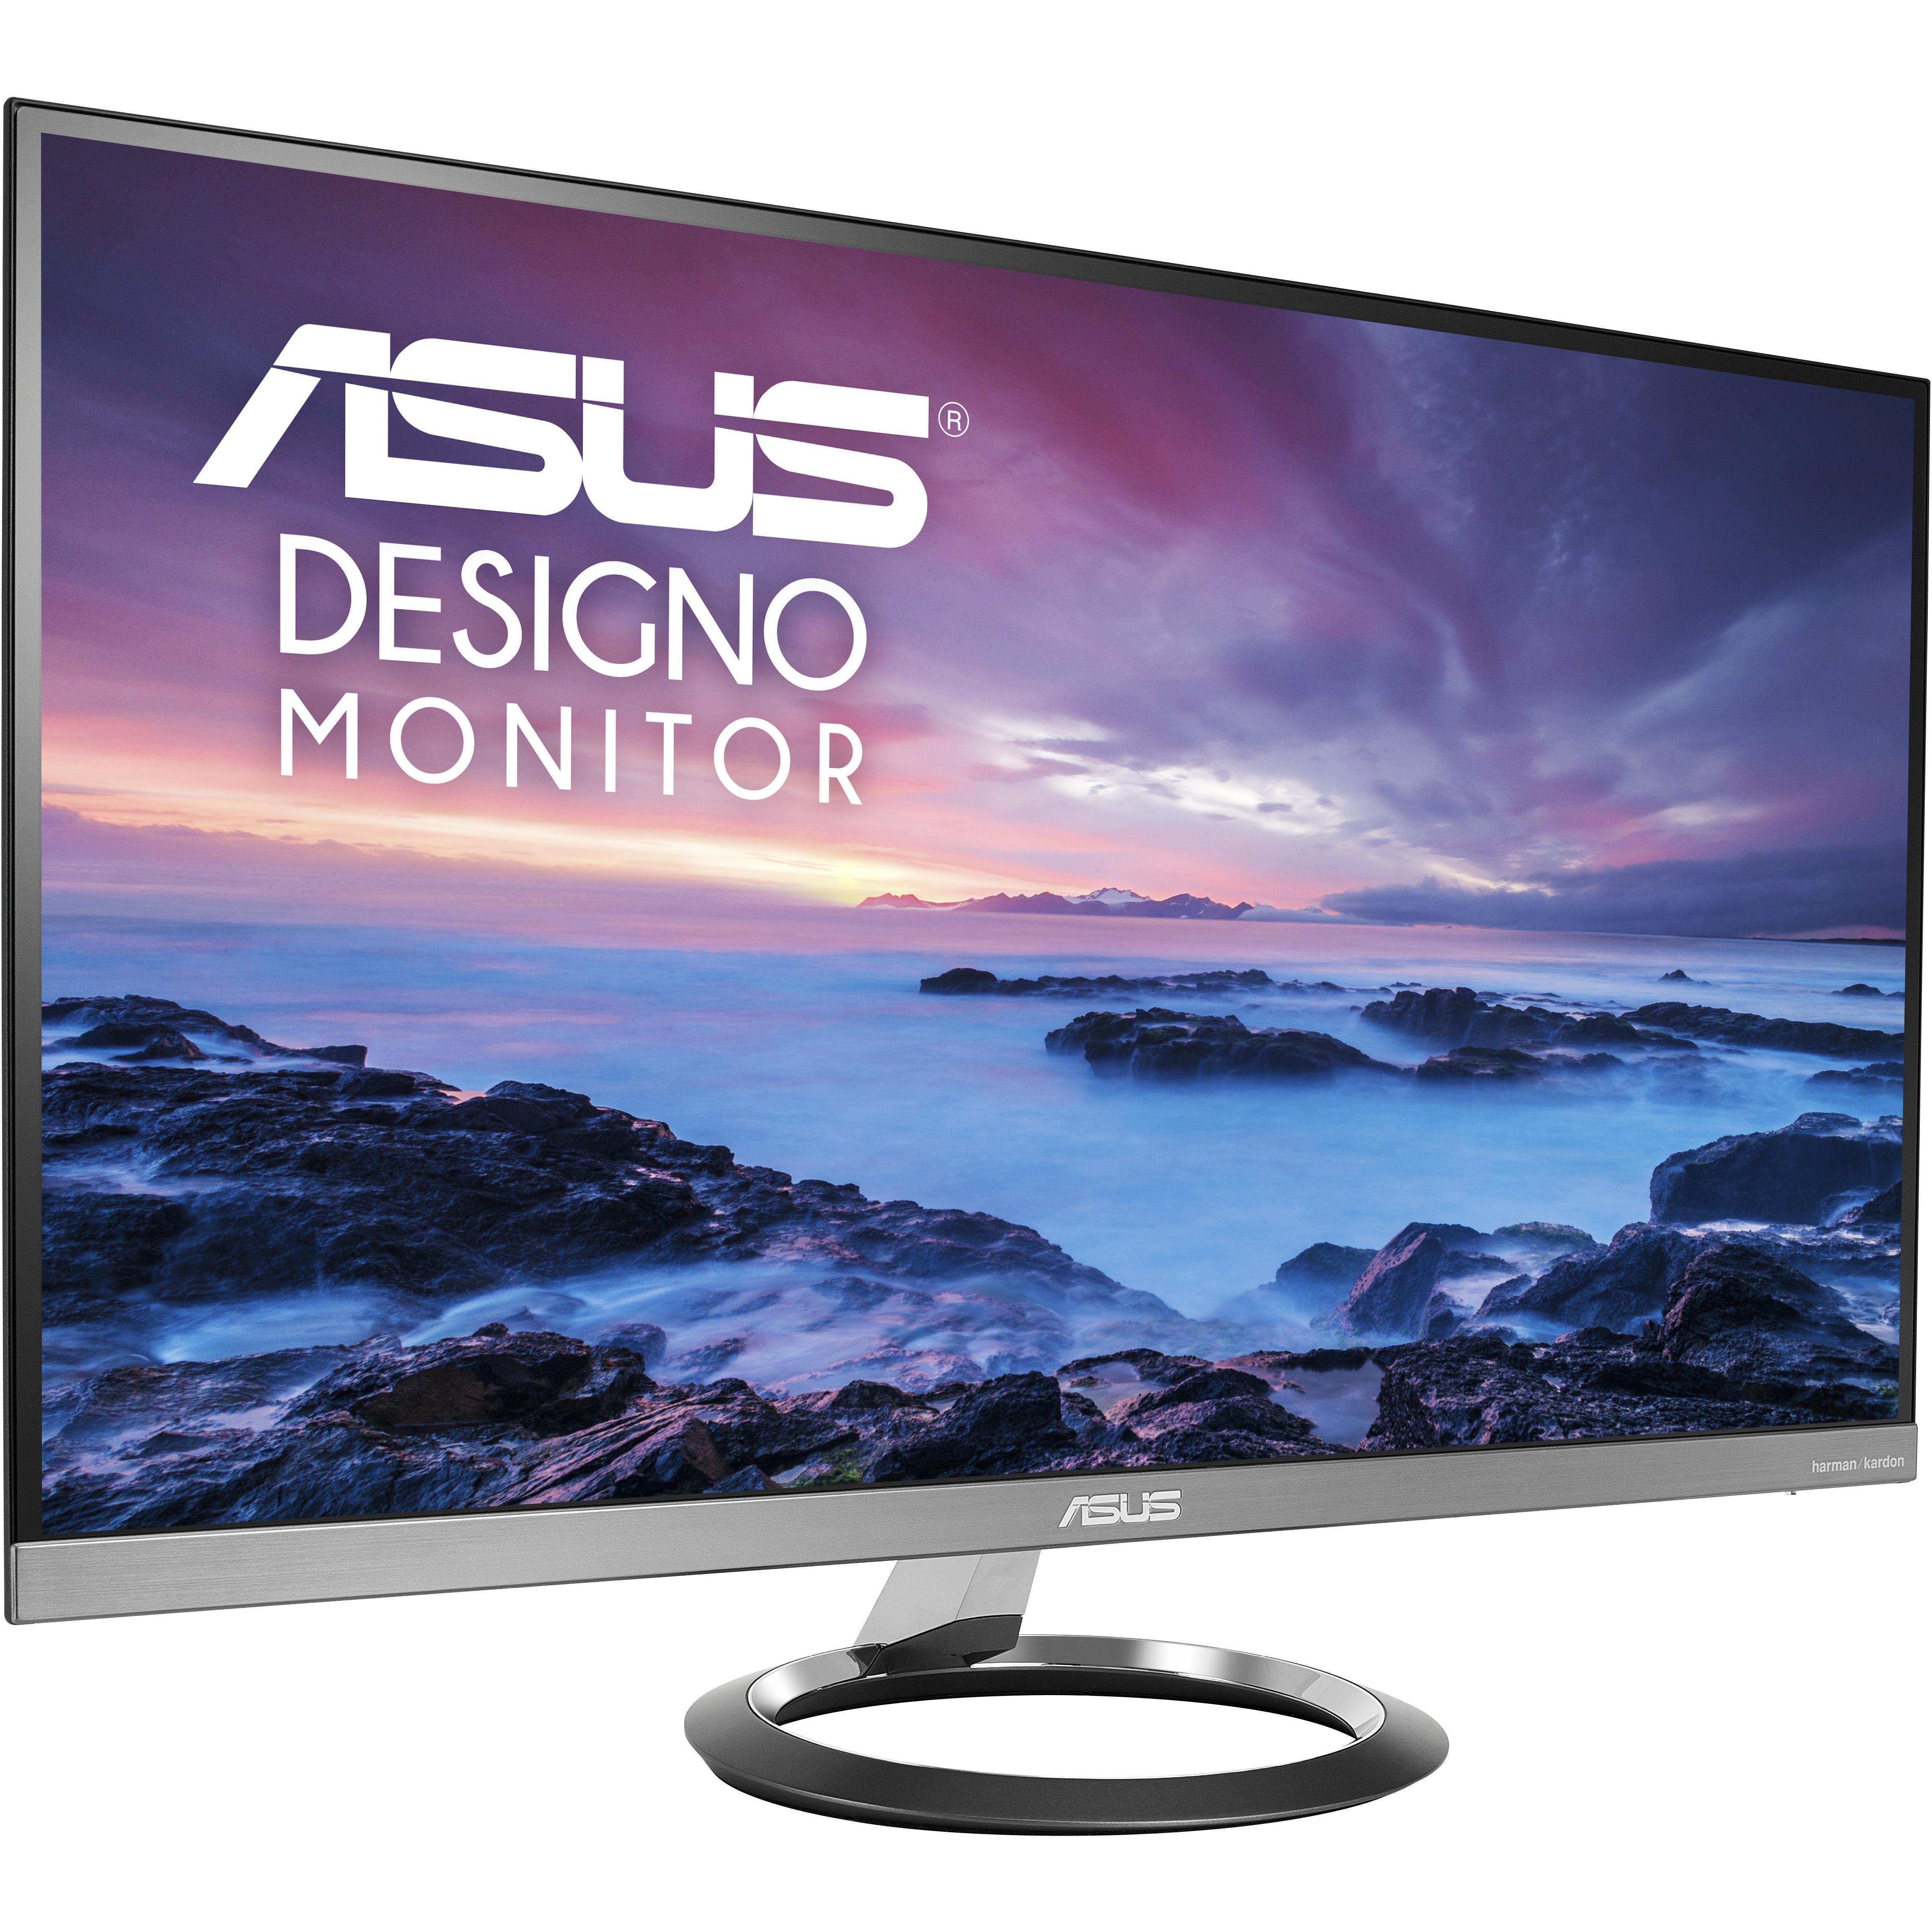 ASUS Designo MZ27AQ Ultraslim Monitor 27inch Frameless,  Sub-woofer, Audio by Harman Kardon